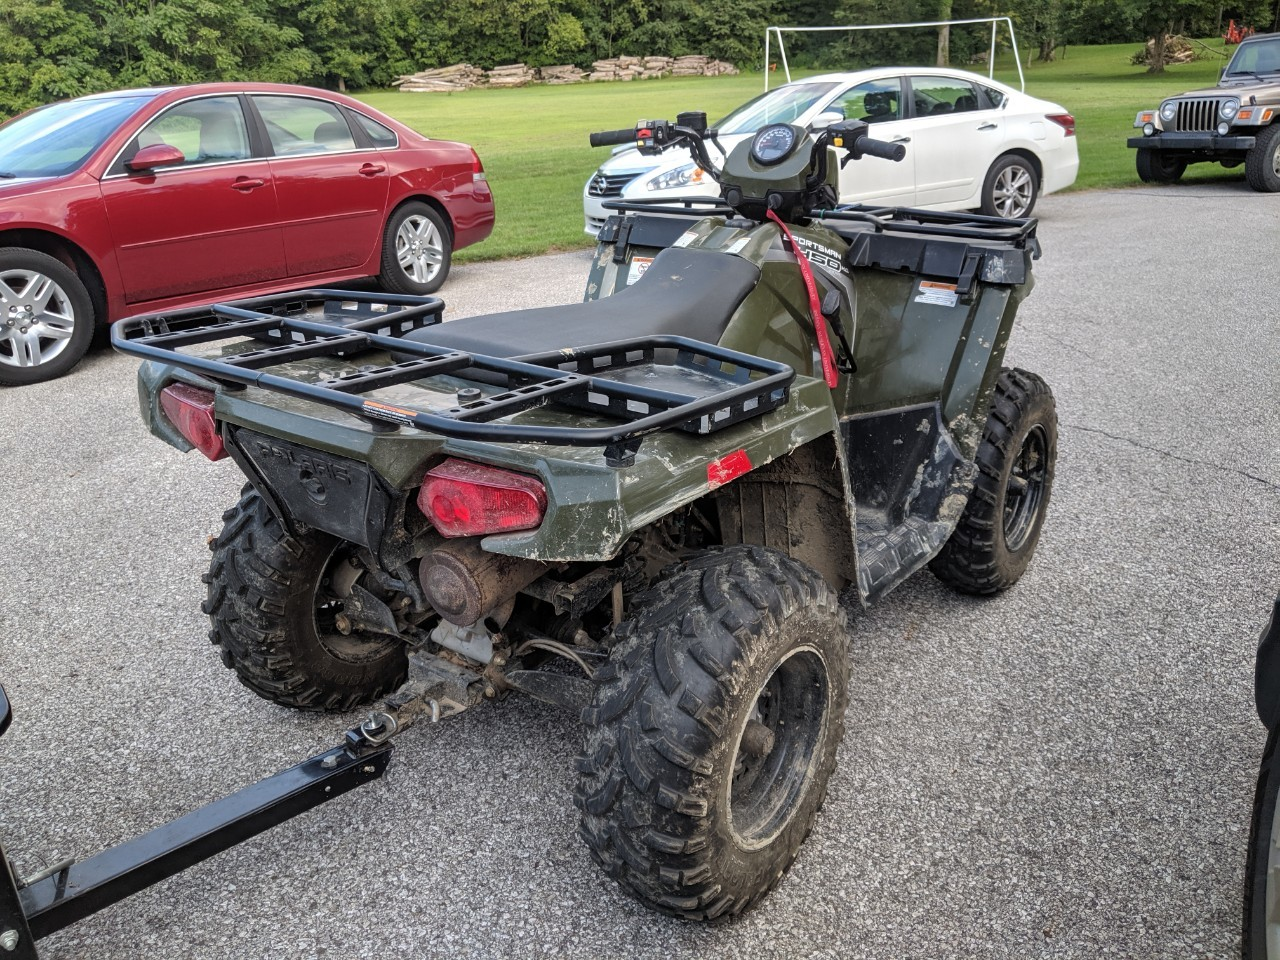 Used Polaris For Sale - Polaris ATVs - Snowmobile Trader